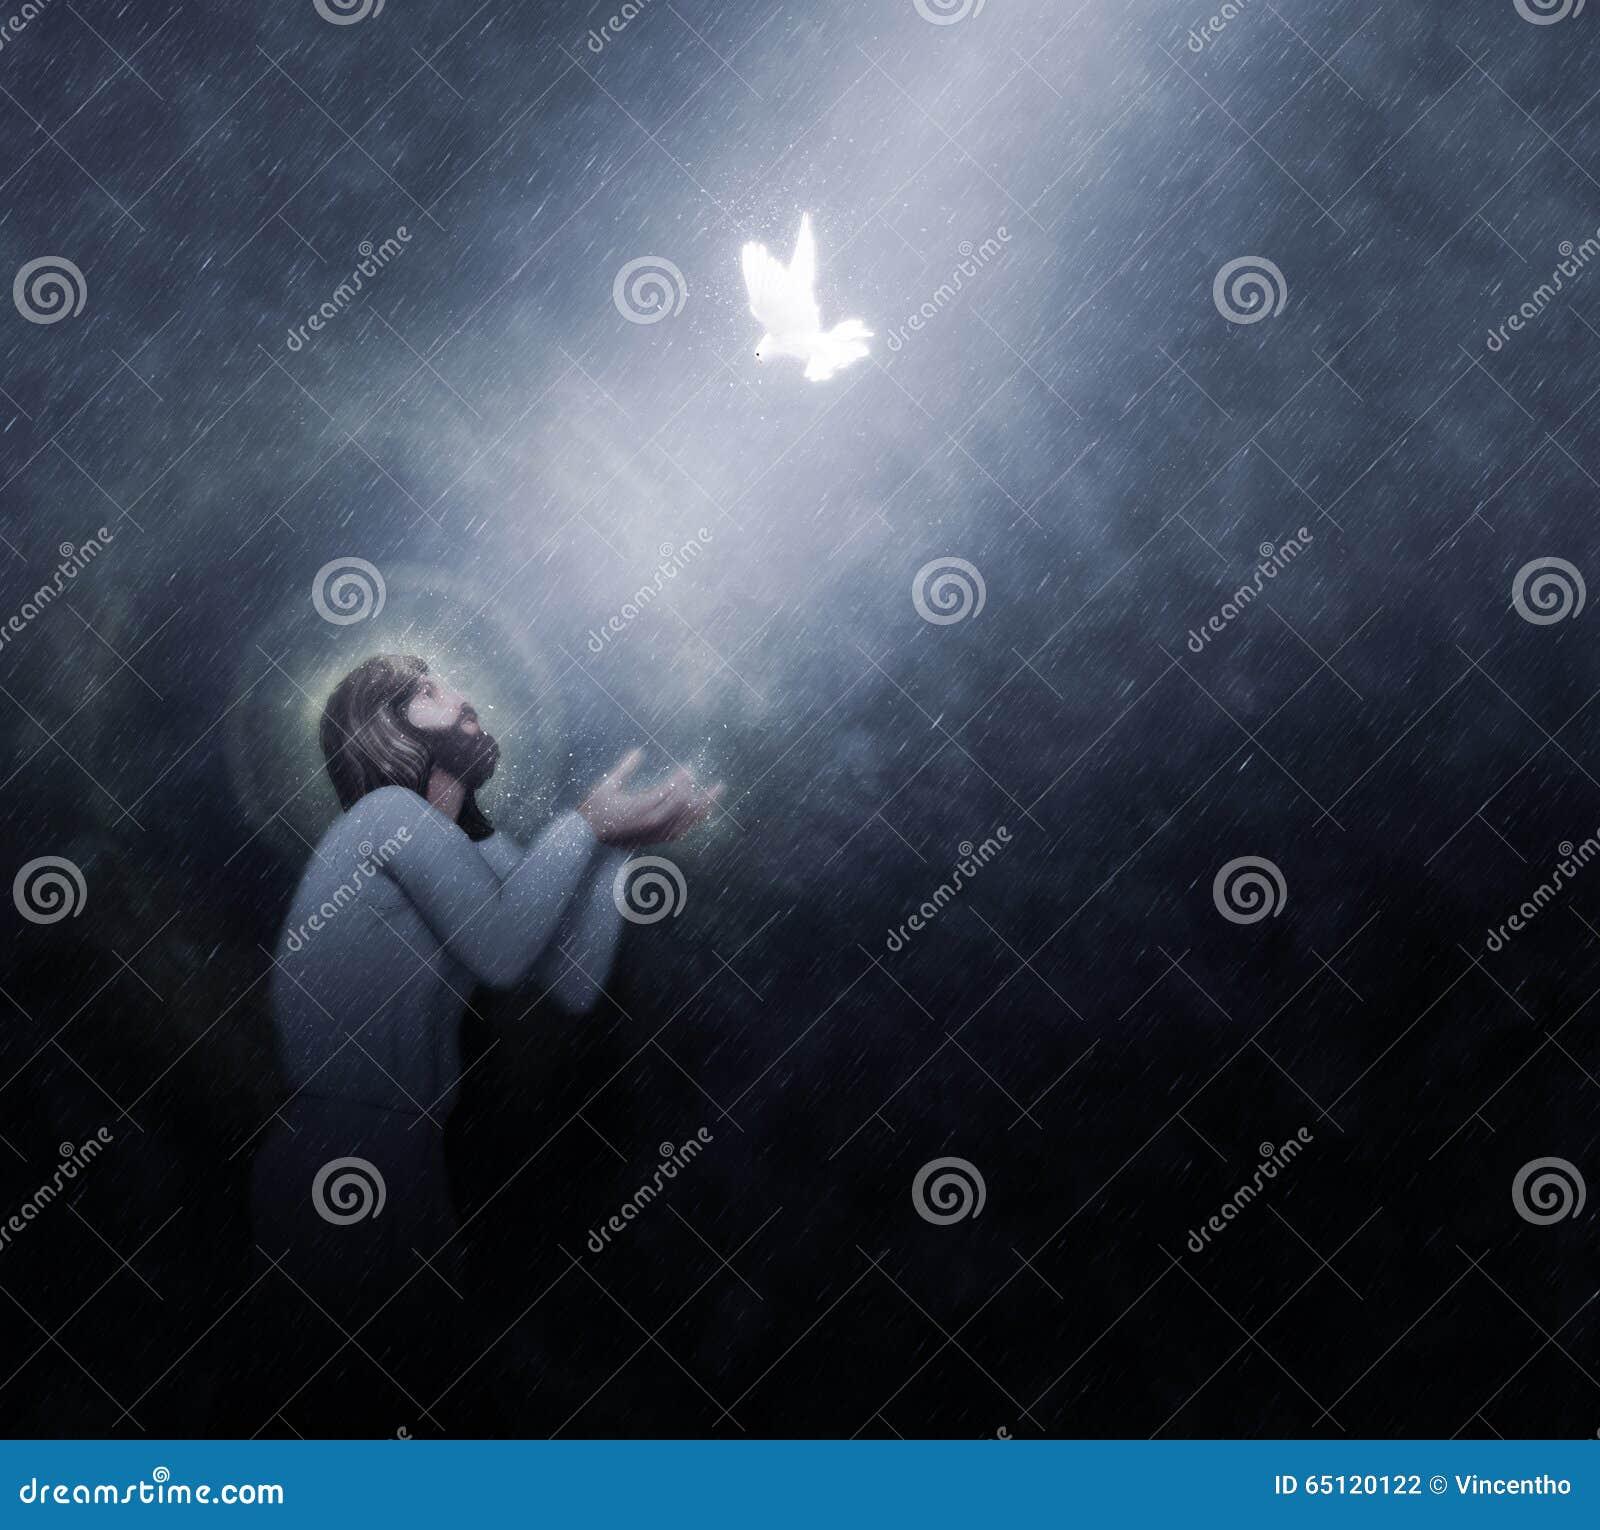 jesus baptism by the heavens rain illustration stock illustration